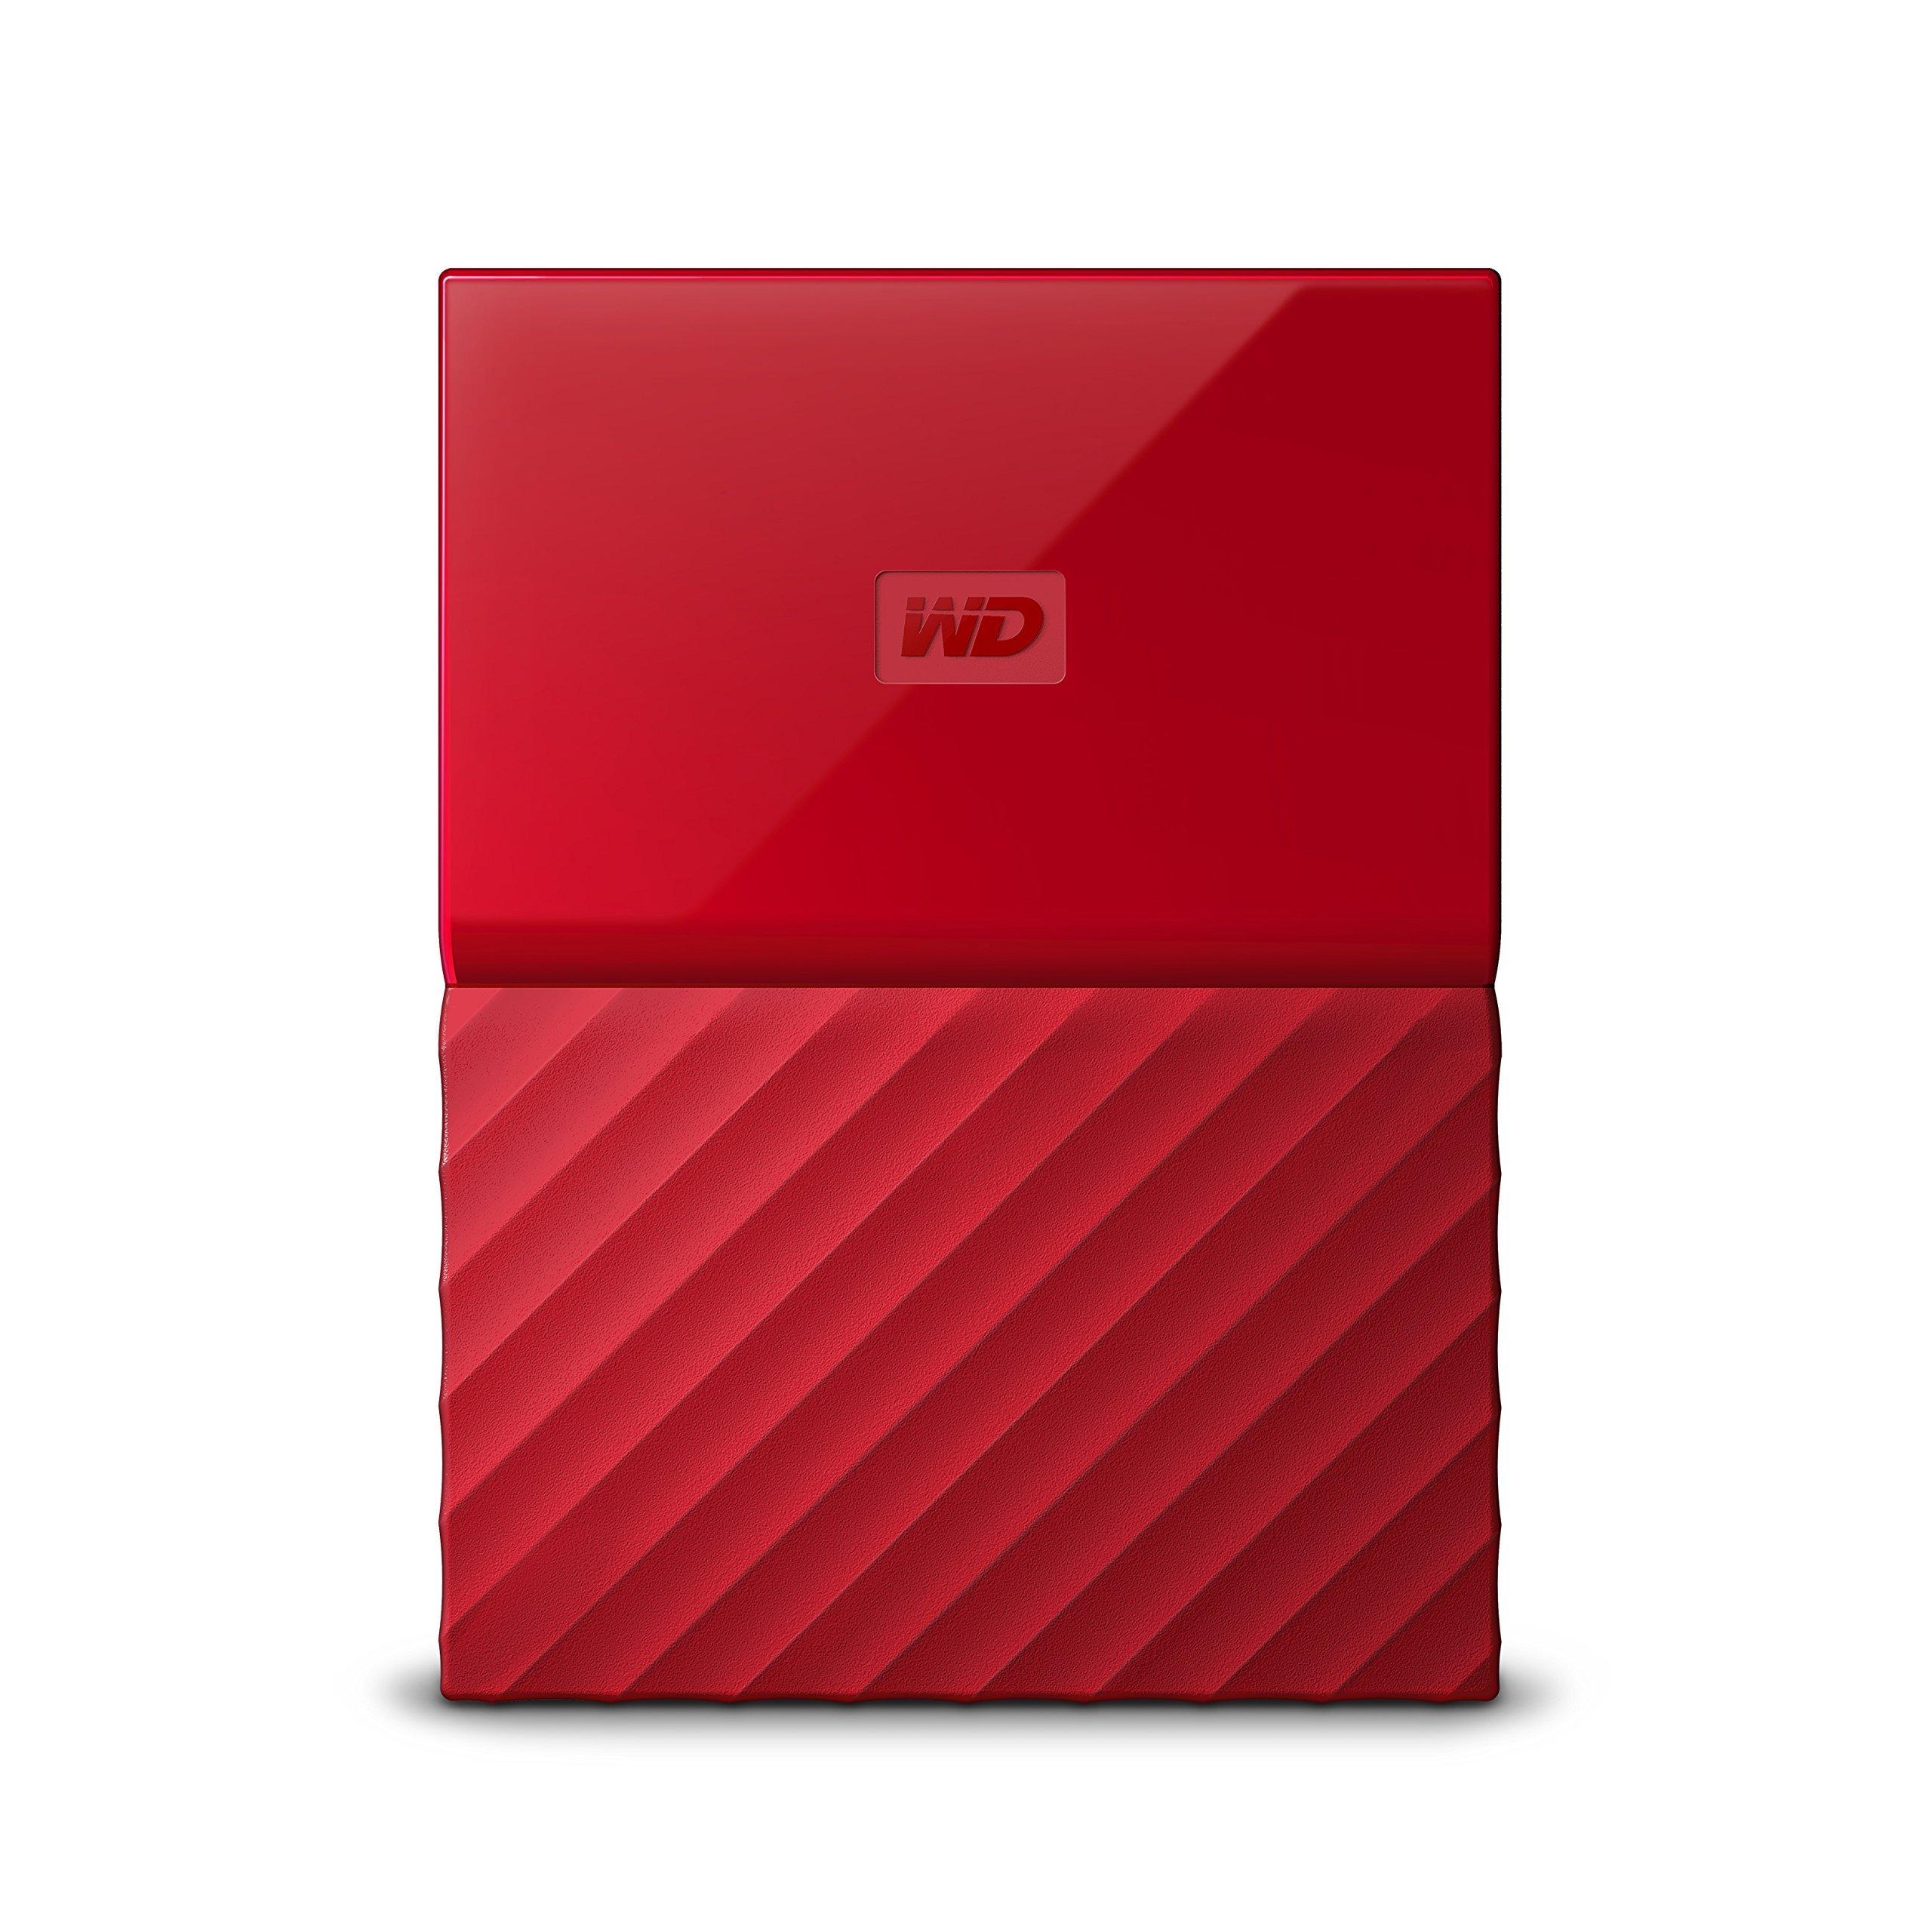 WD 2TB Red My Passport Portable External Hard Drive - USB 3.0 - WDBYFT0020BRD-WESN (Certified Refurbished)